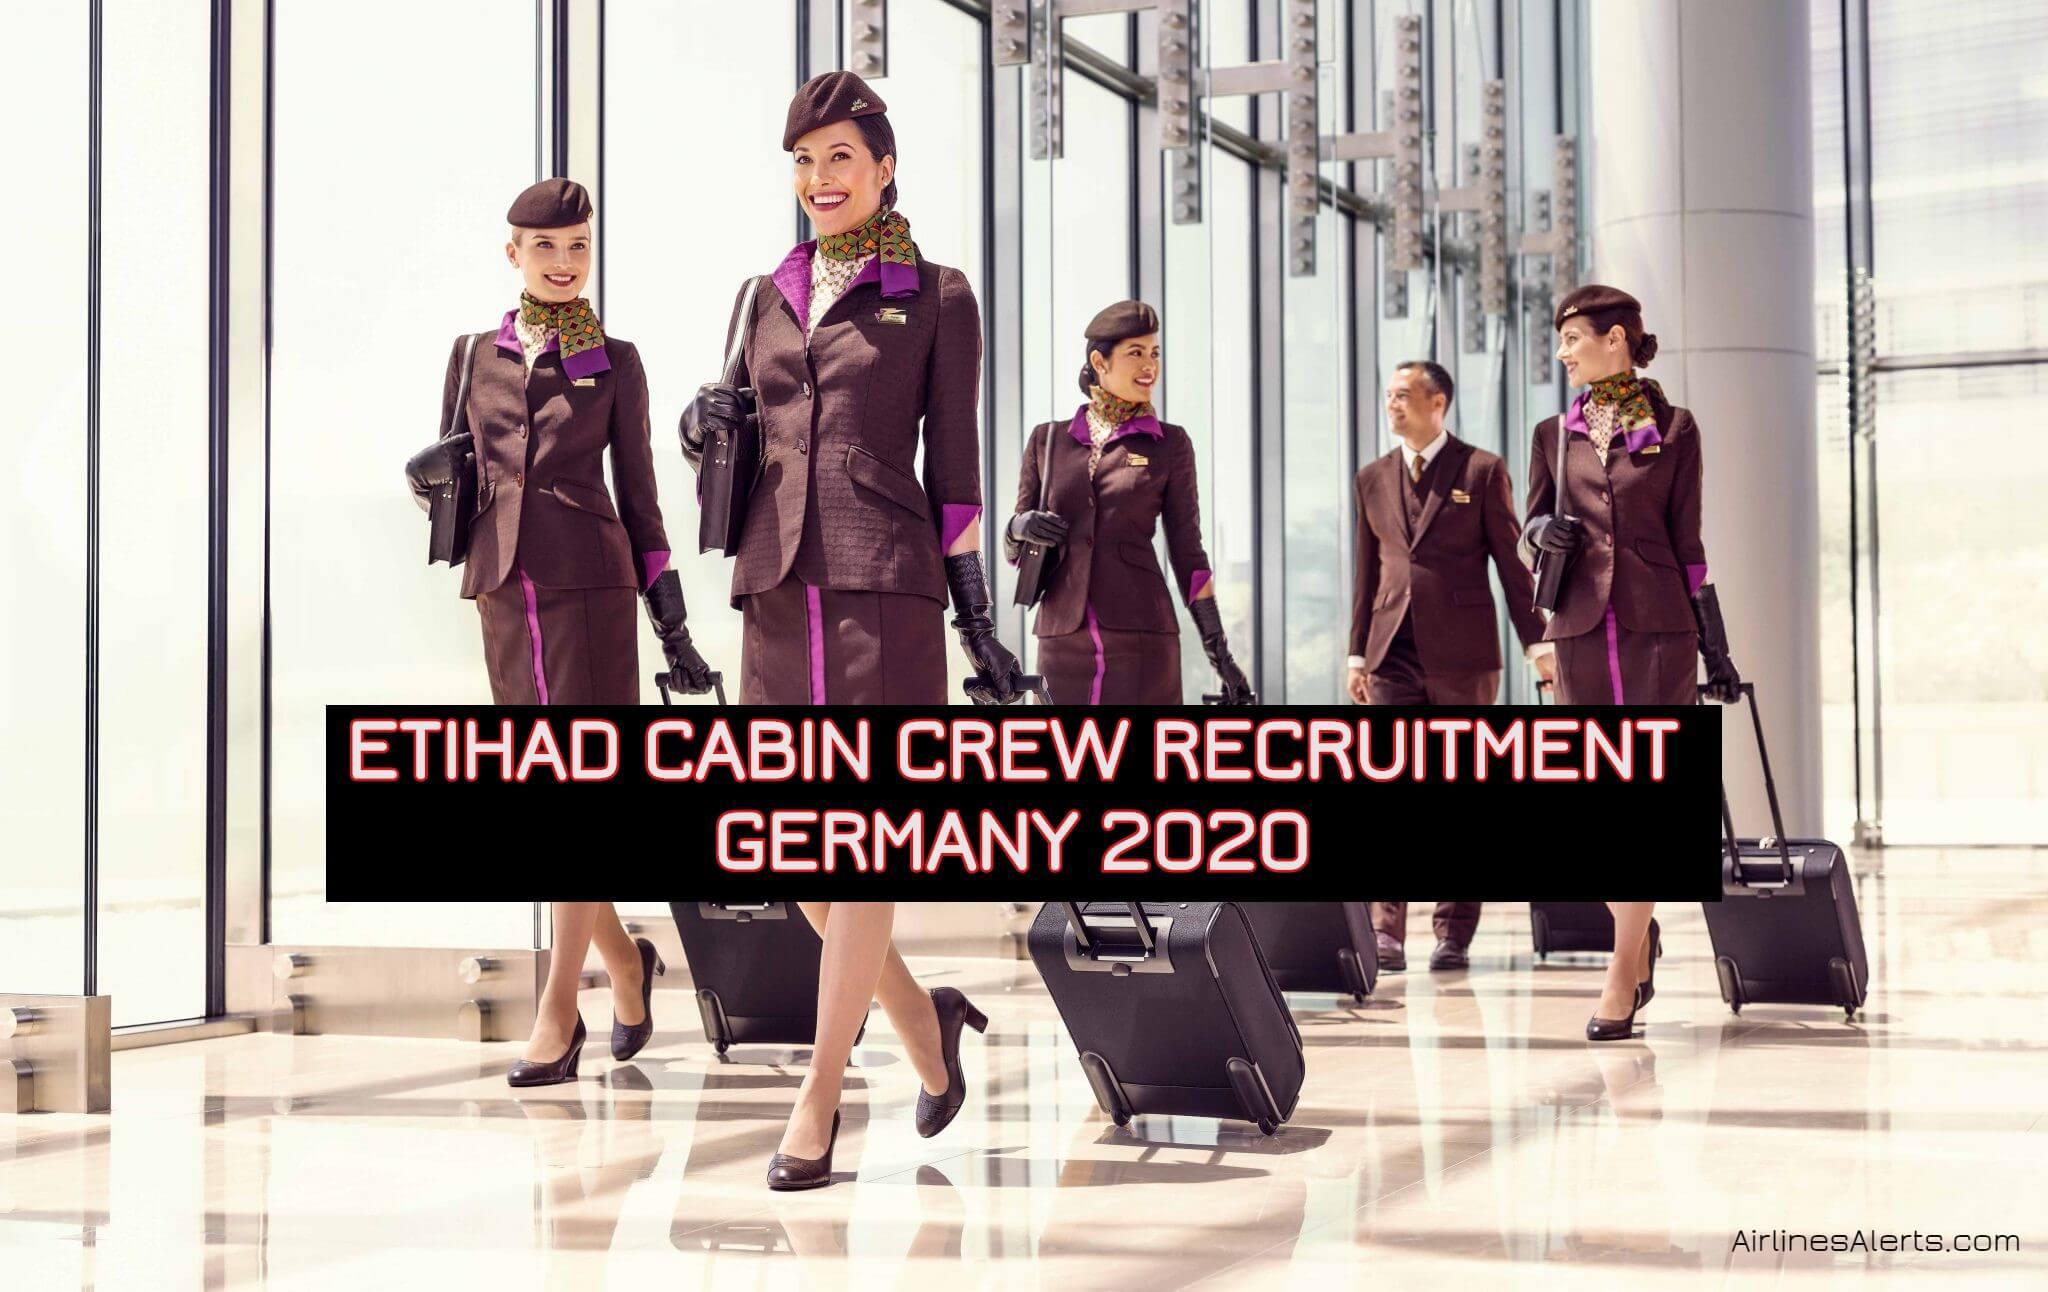 Etihad Cabin Crew Recruitment Germany 2020 - Frankfurt Centre